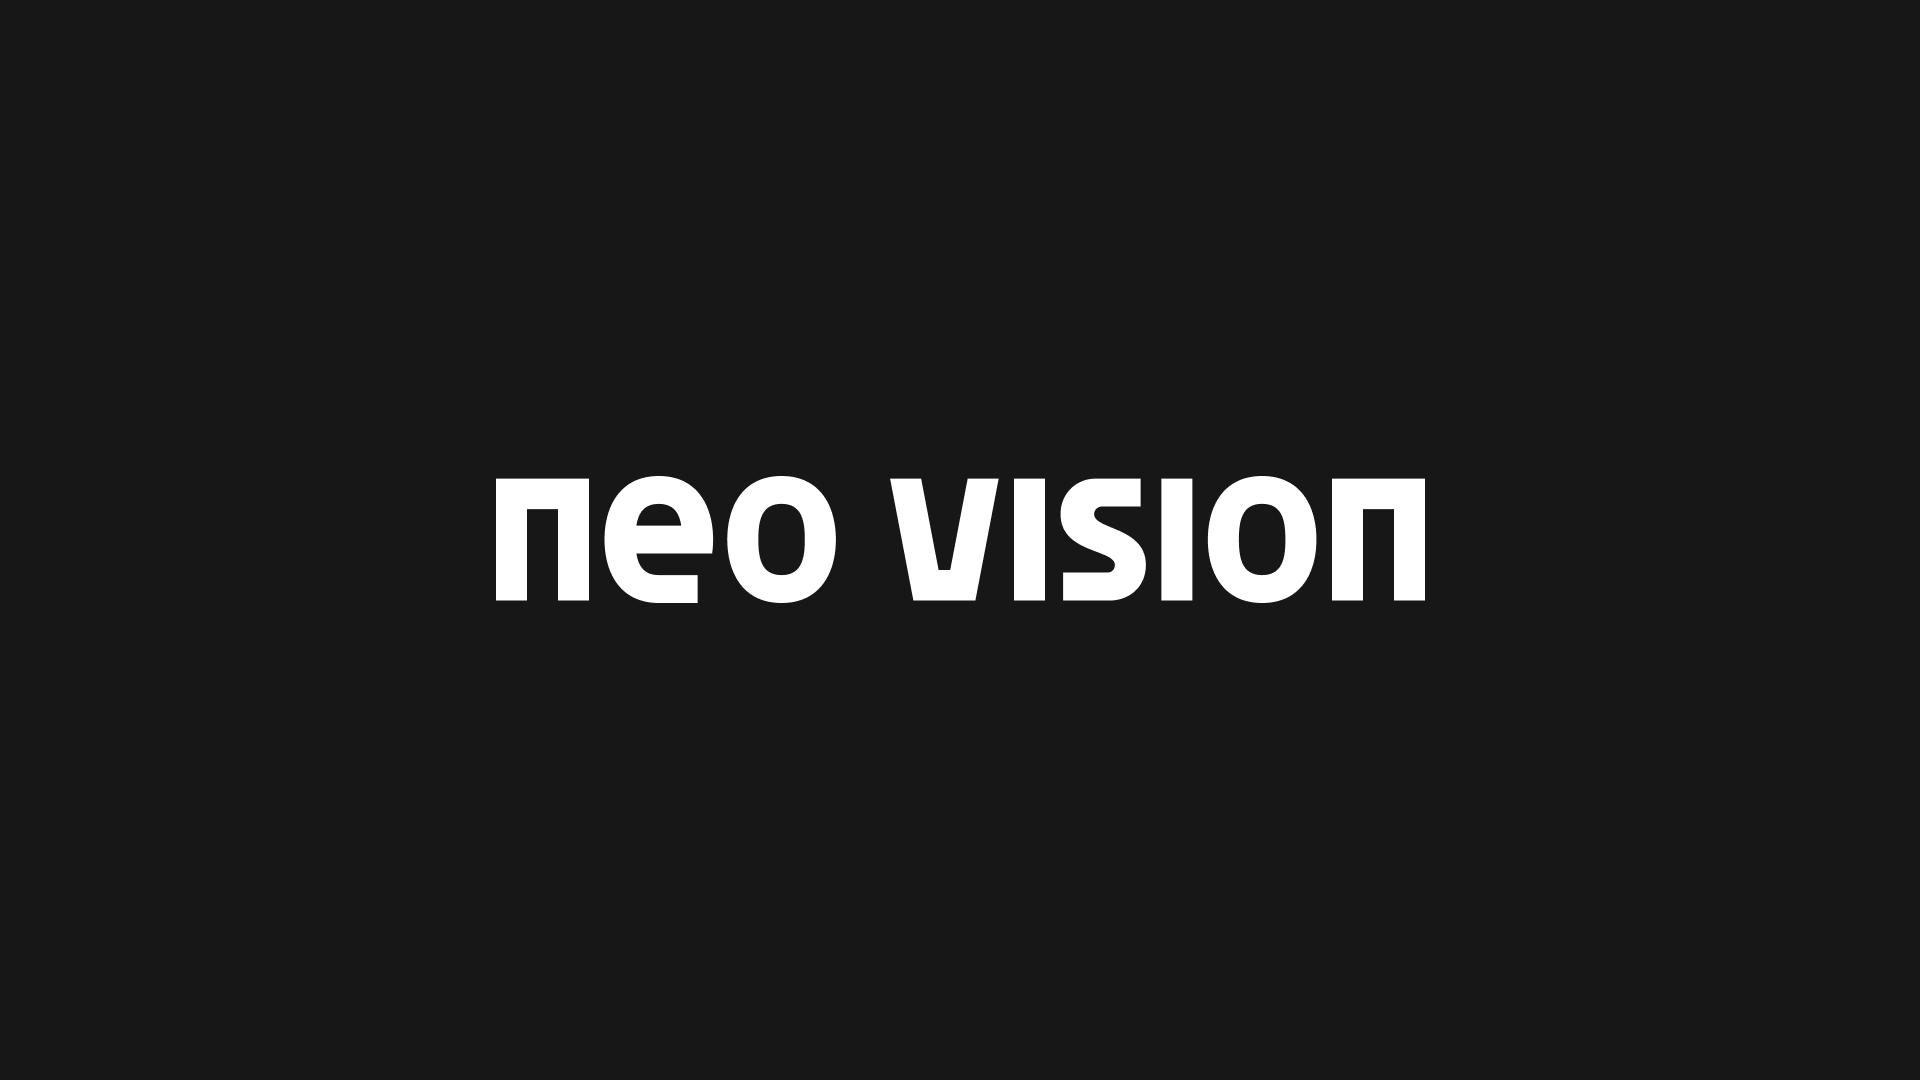 Neo-Vision-2